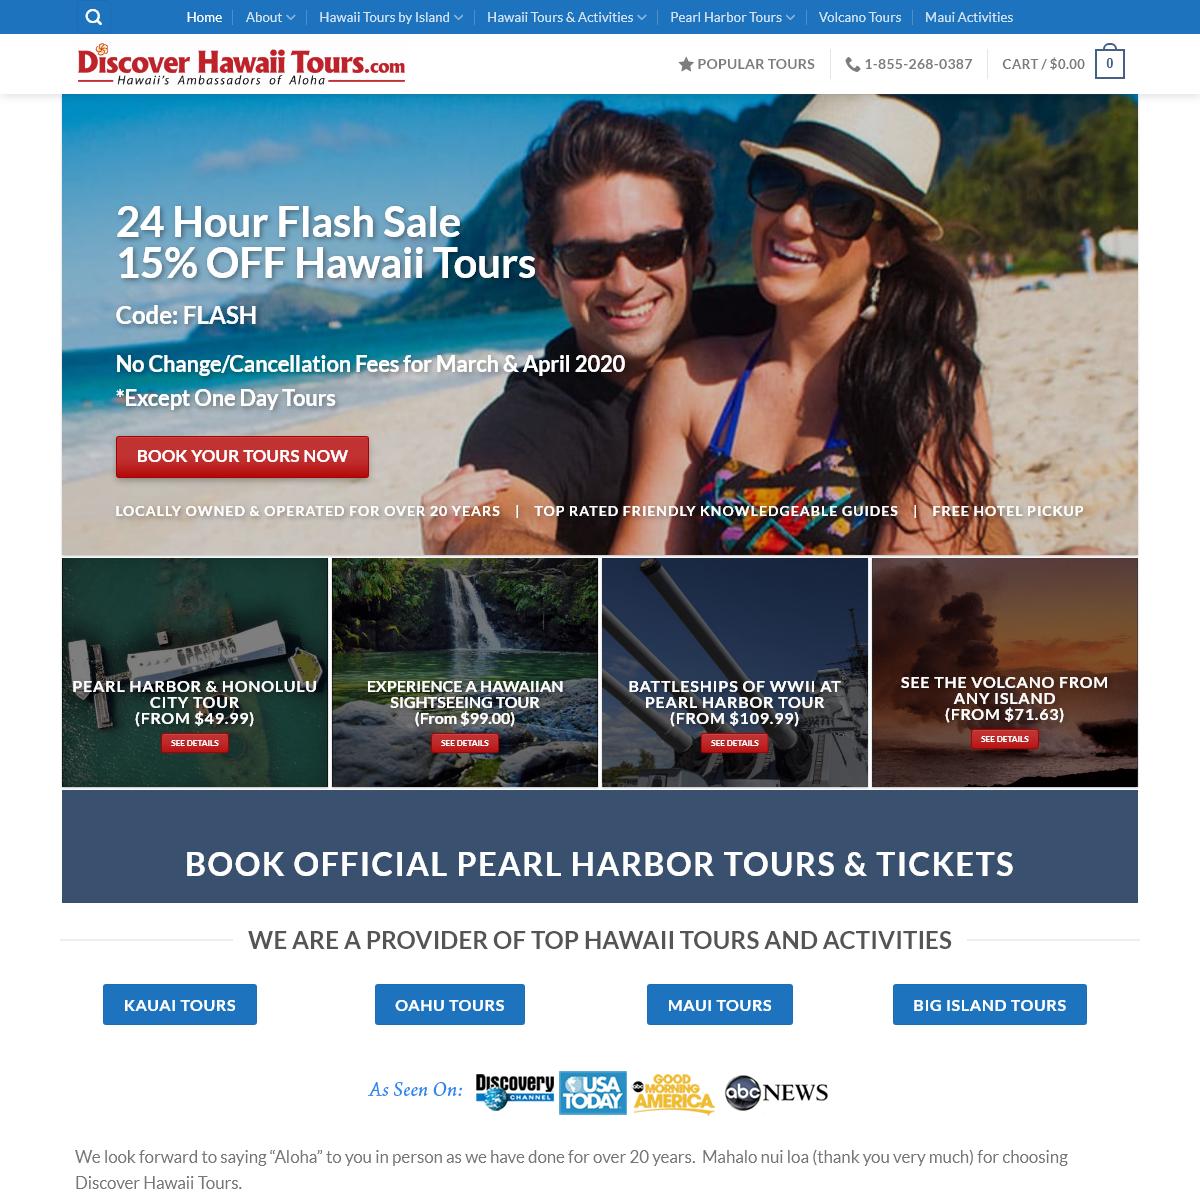 Hawaii Tours & Activities Site in Oahu, Maui, Kauai, Big Island & Pearl Harbor